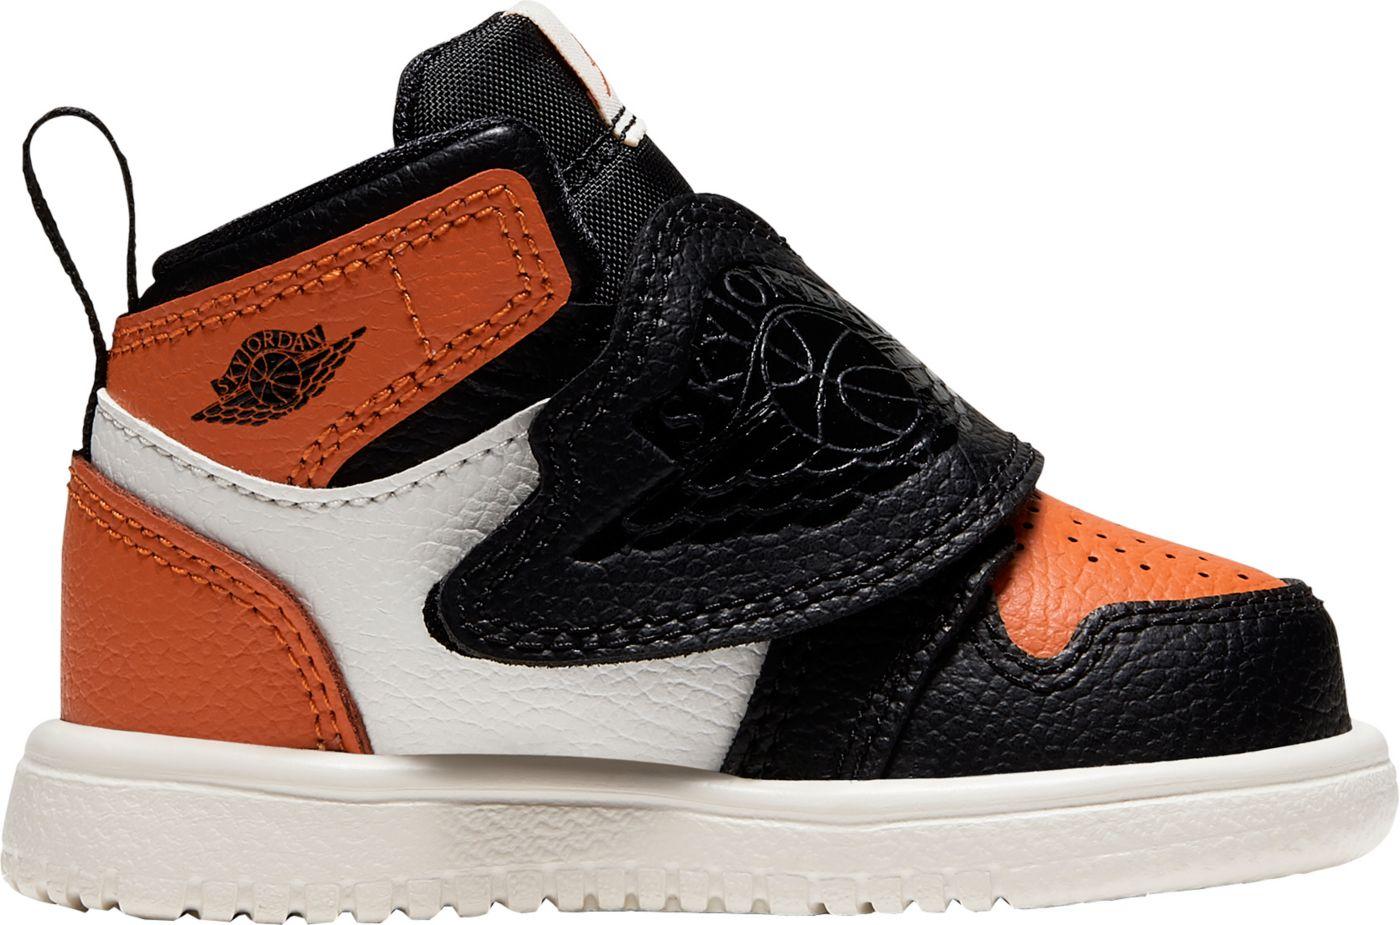 Nike Toddler Sky Jordan 1 Basketball Shoes